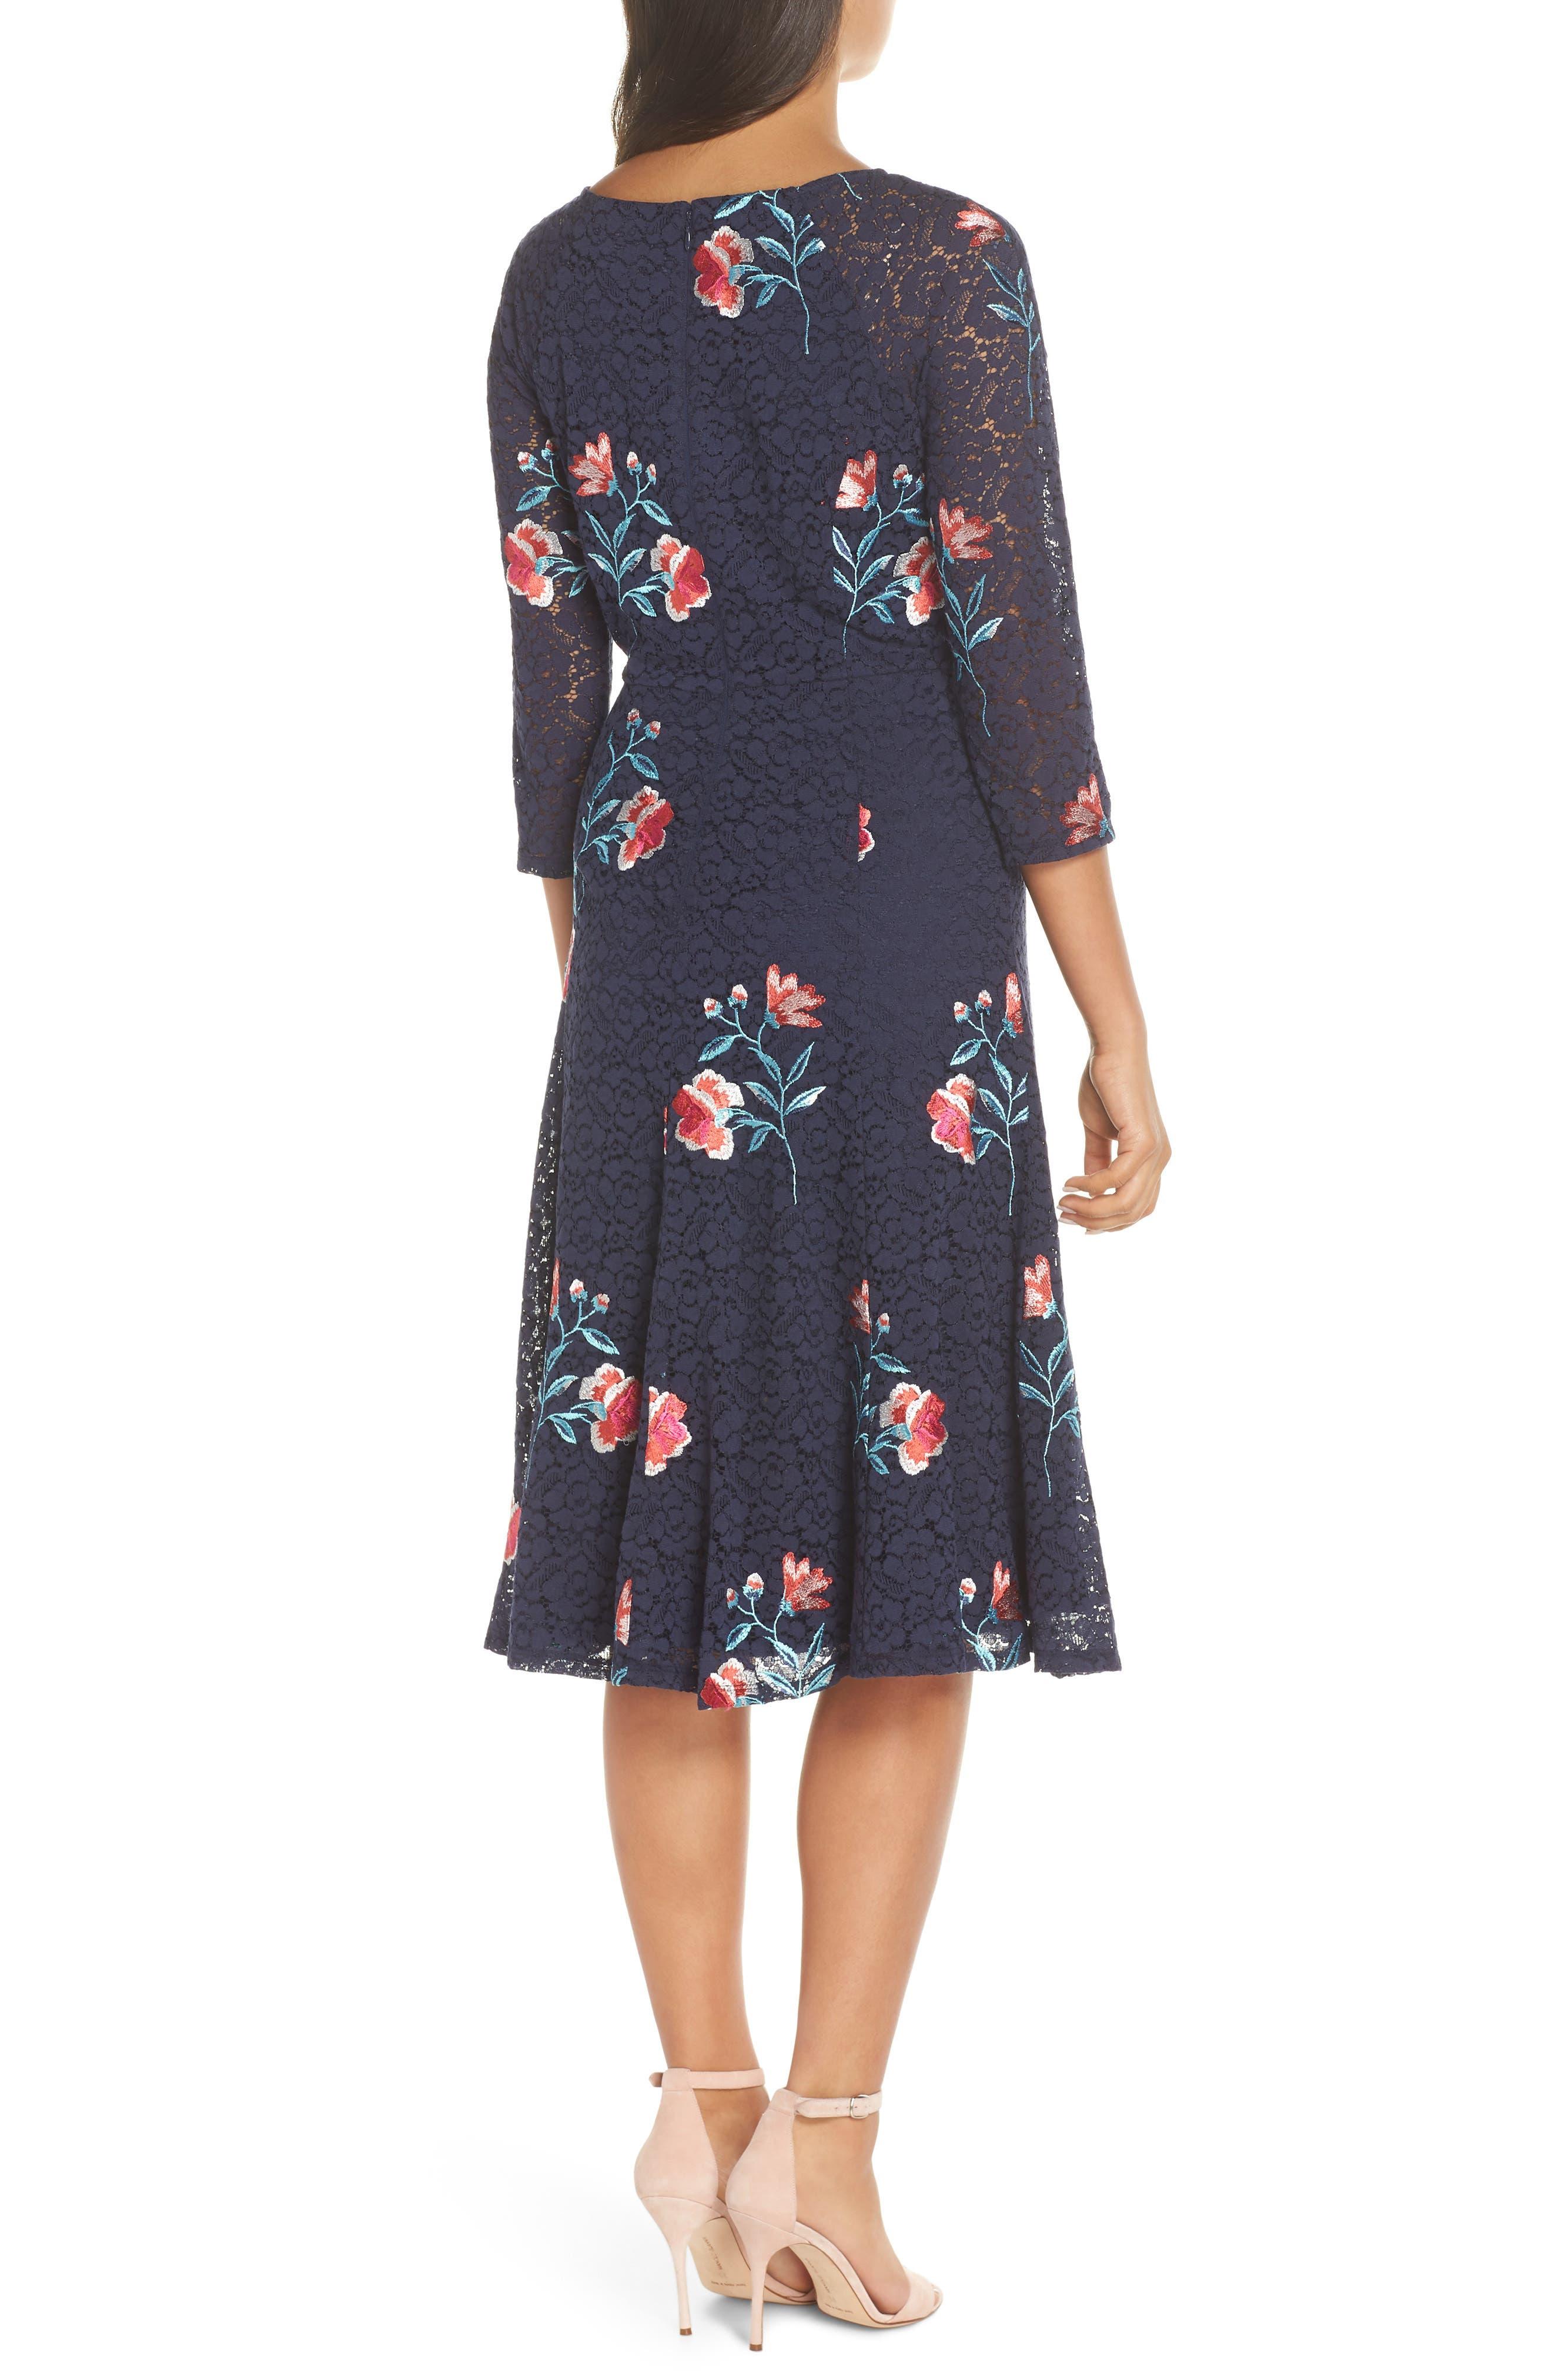 ELIZA J, Embroidery & Lace A-Line Dress, Alternate thumbnail 2, color, NAVY